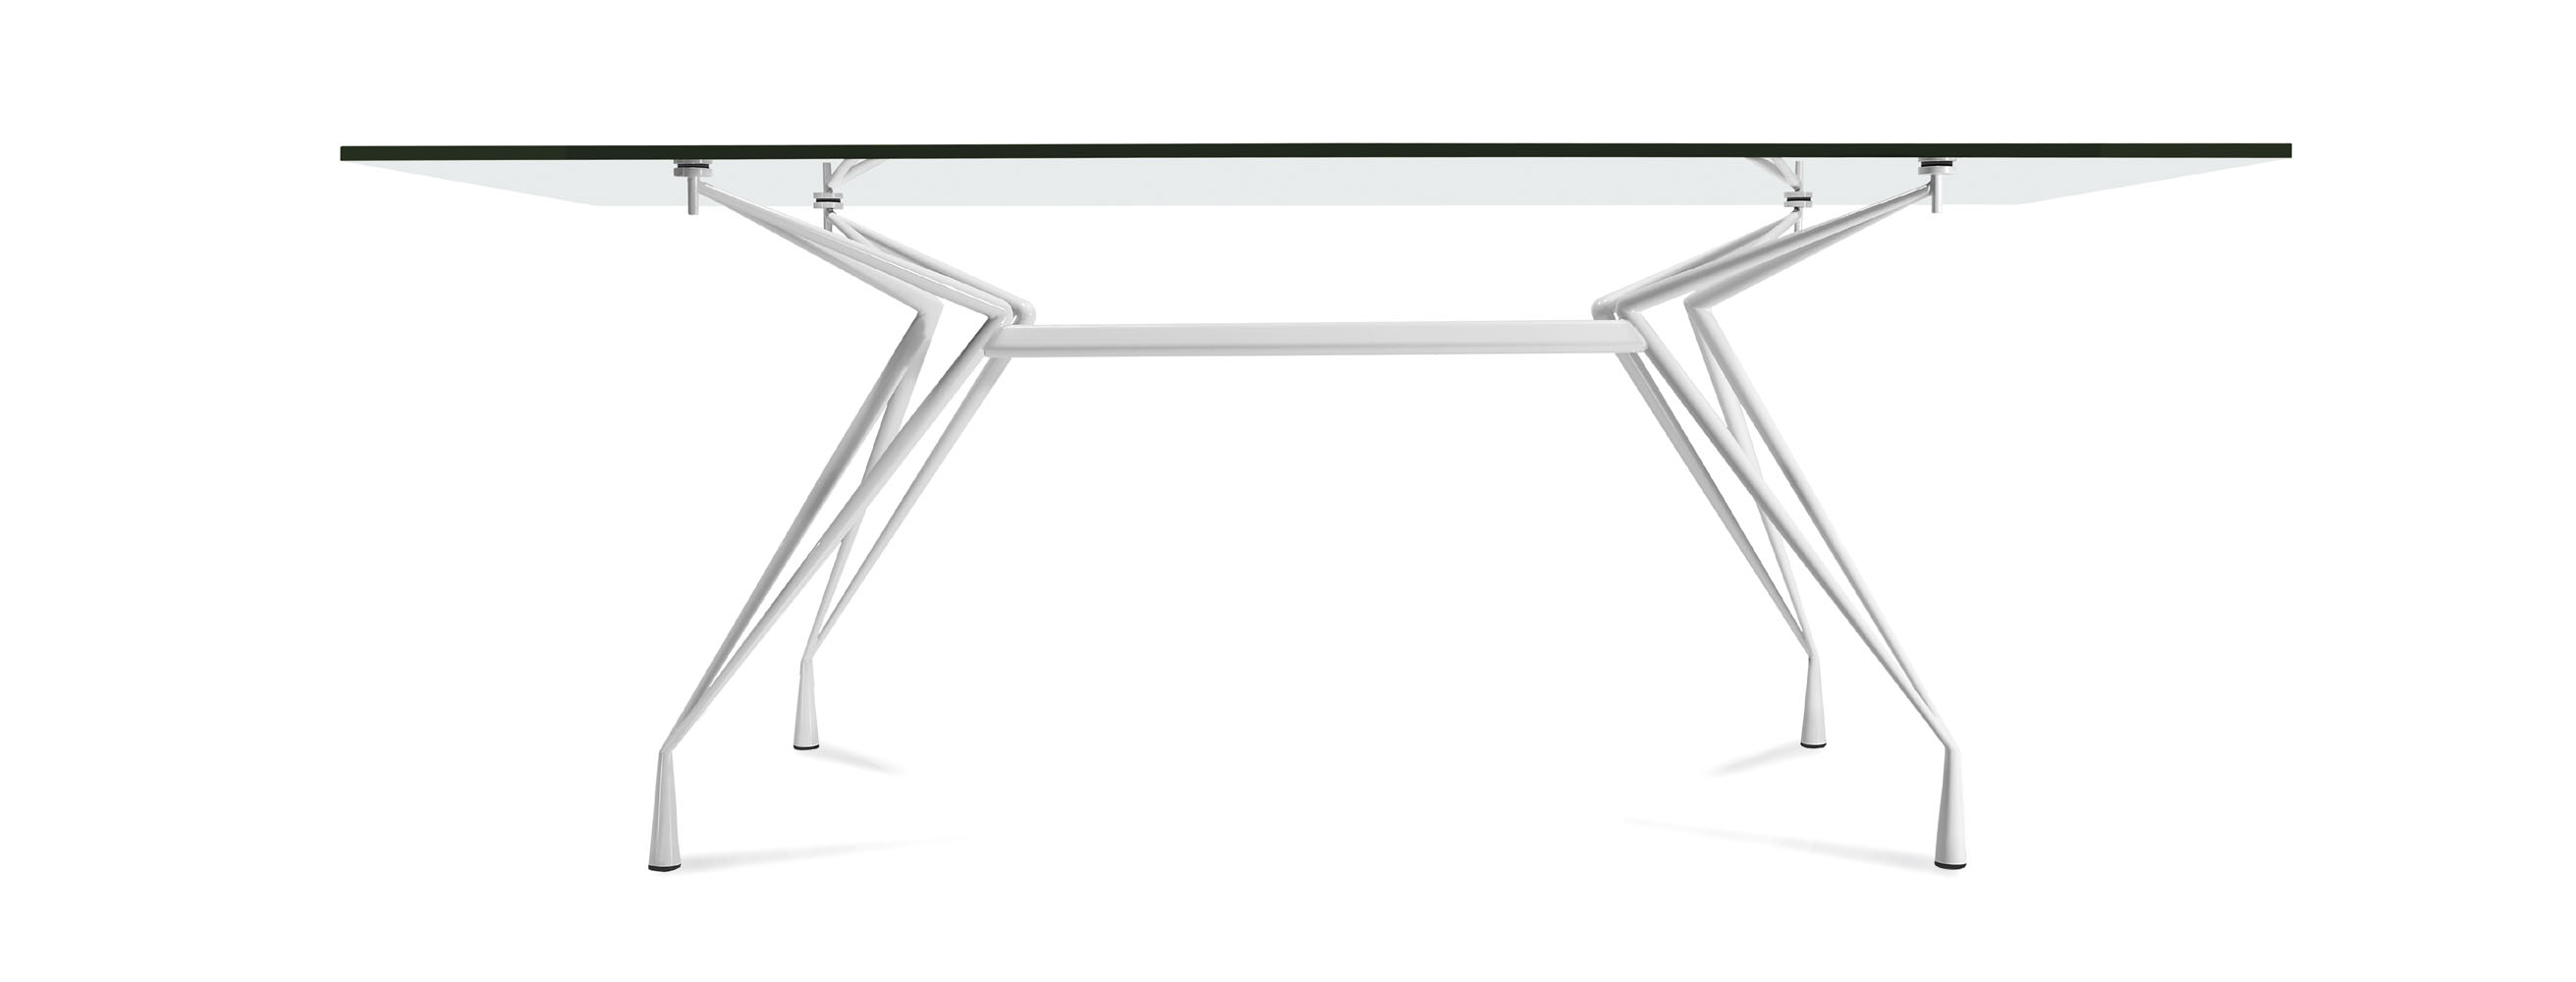 table de r union ovale plateau verre ap 1. Black Bedroom Furniture Sets. Home Design Ideas